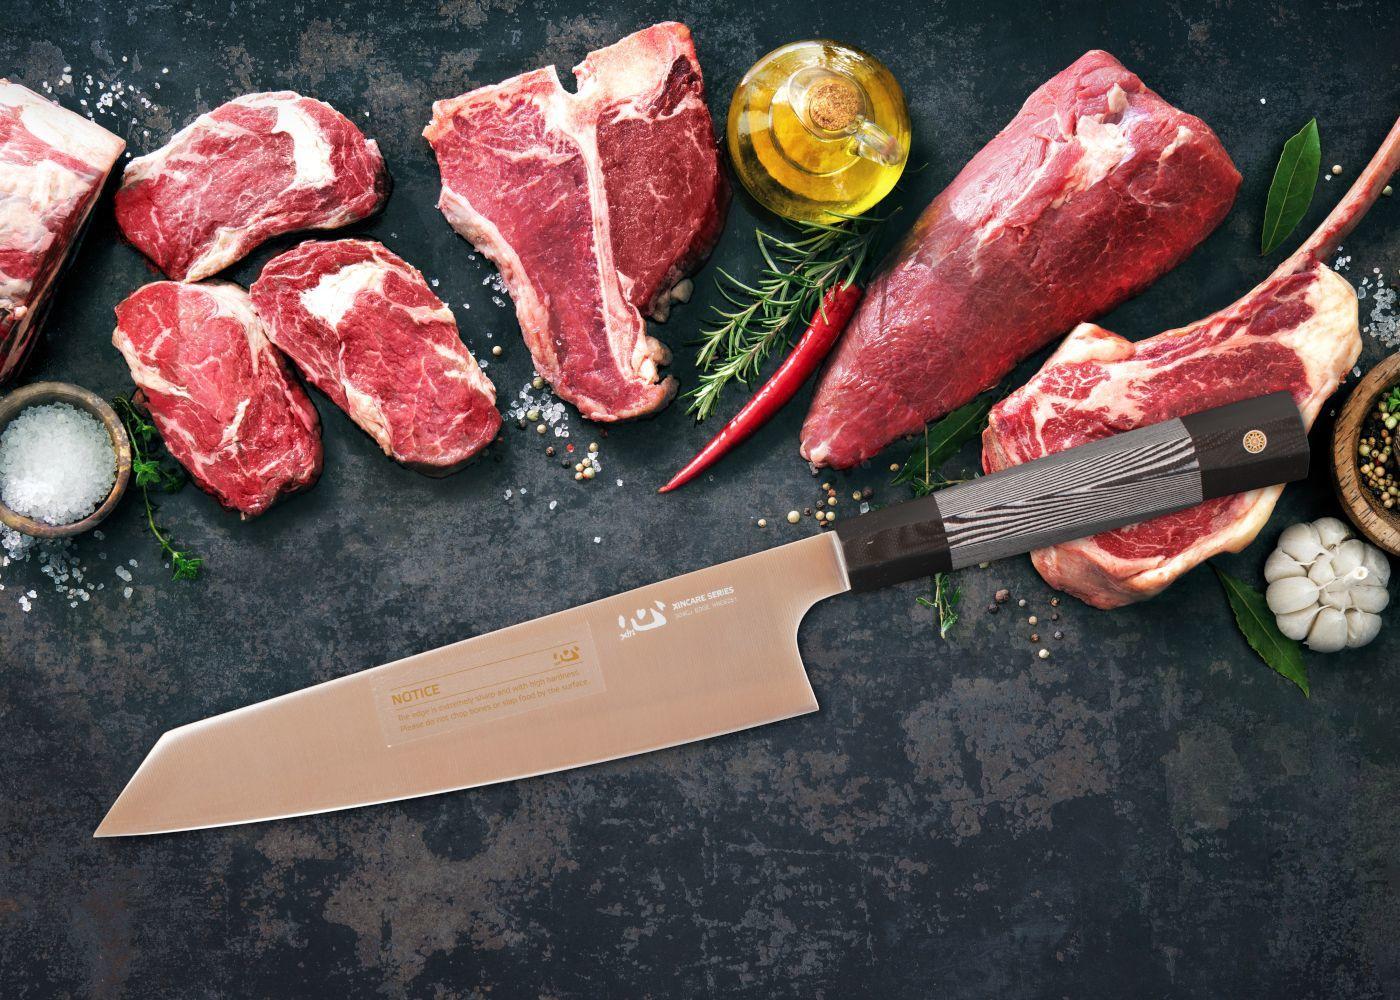 XinCare Gyuto von Xin Cutlery mit Composite Klinge